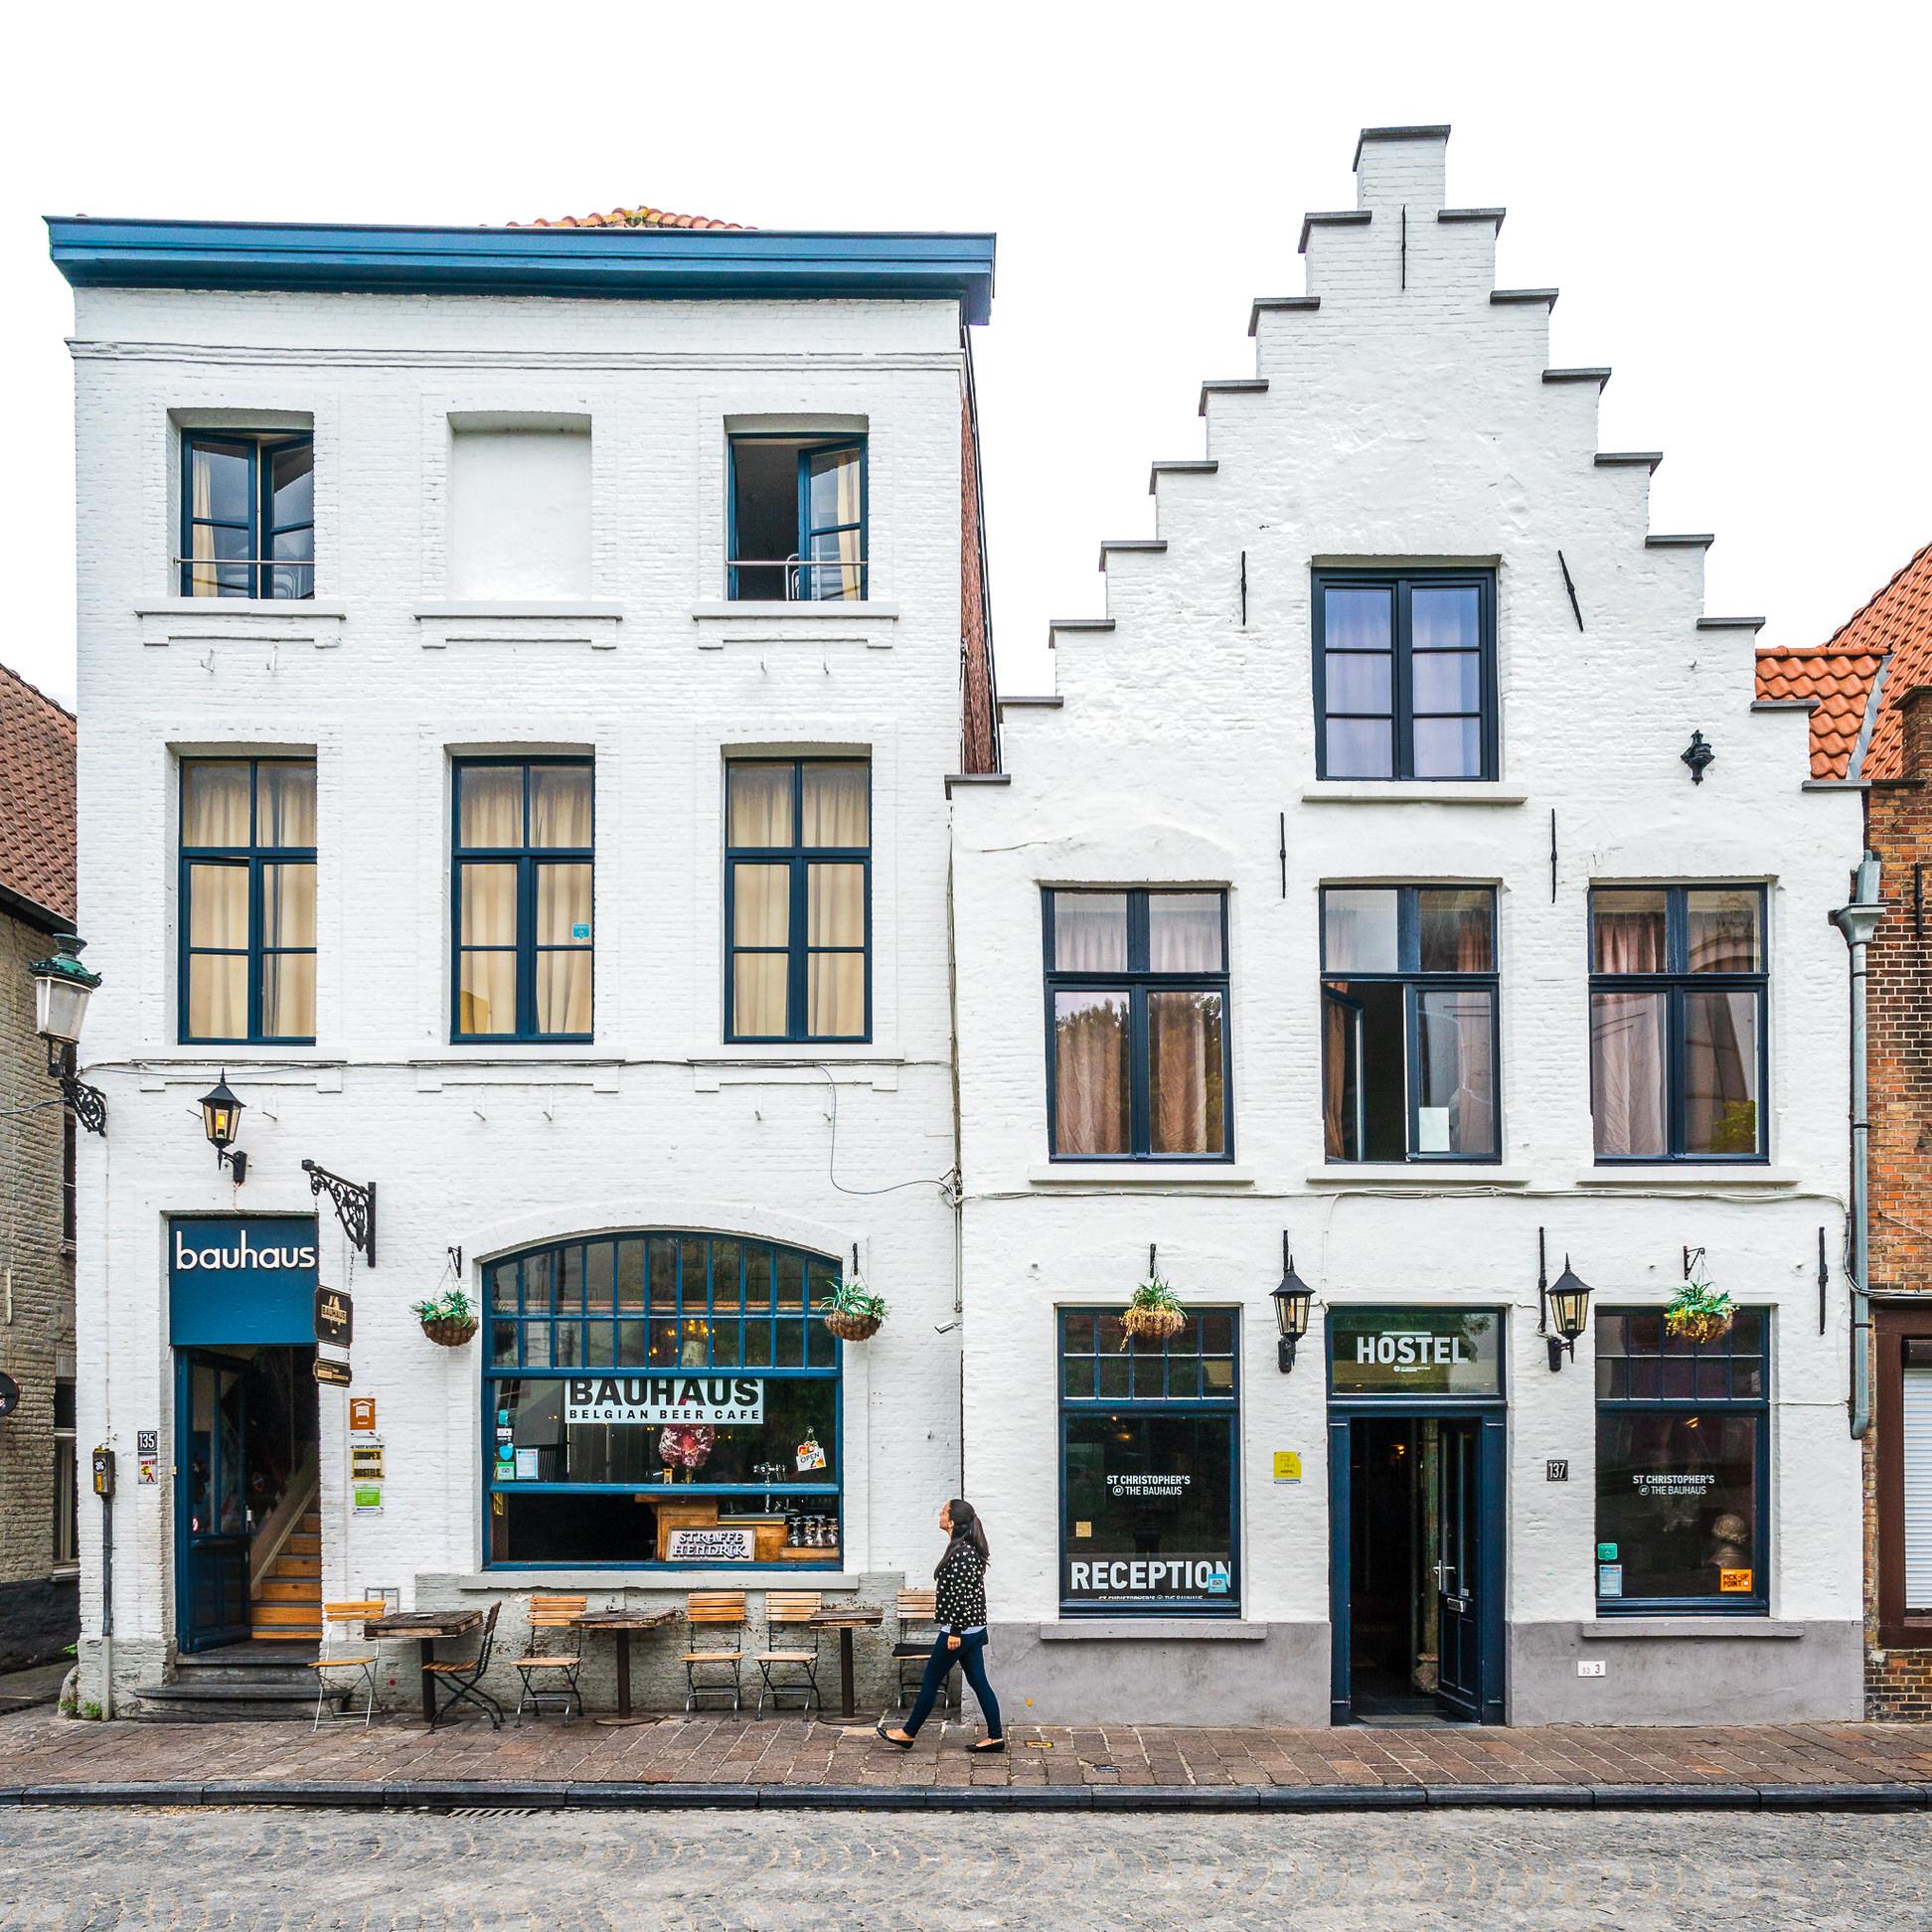 St. Christopher's Inn – Bruges